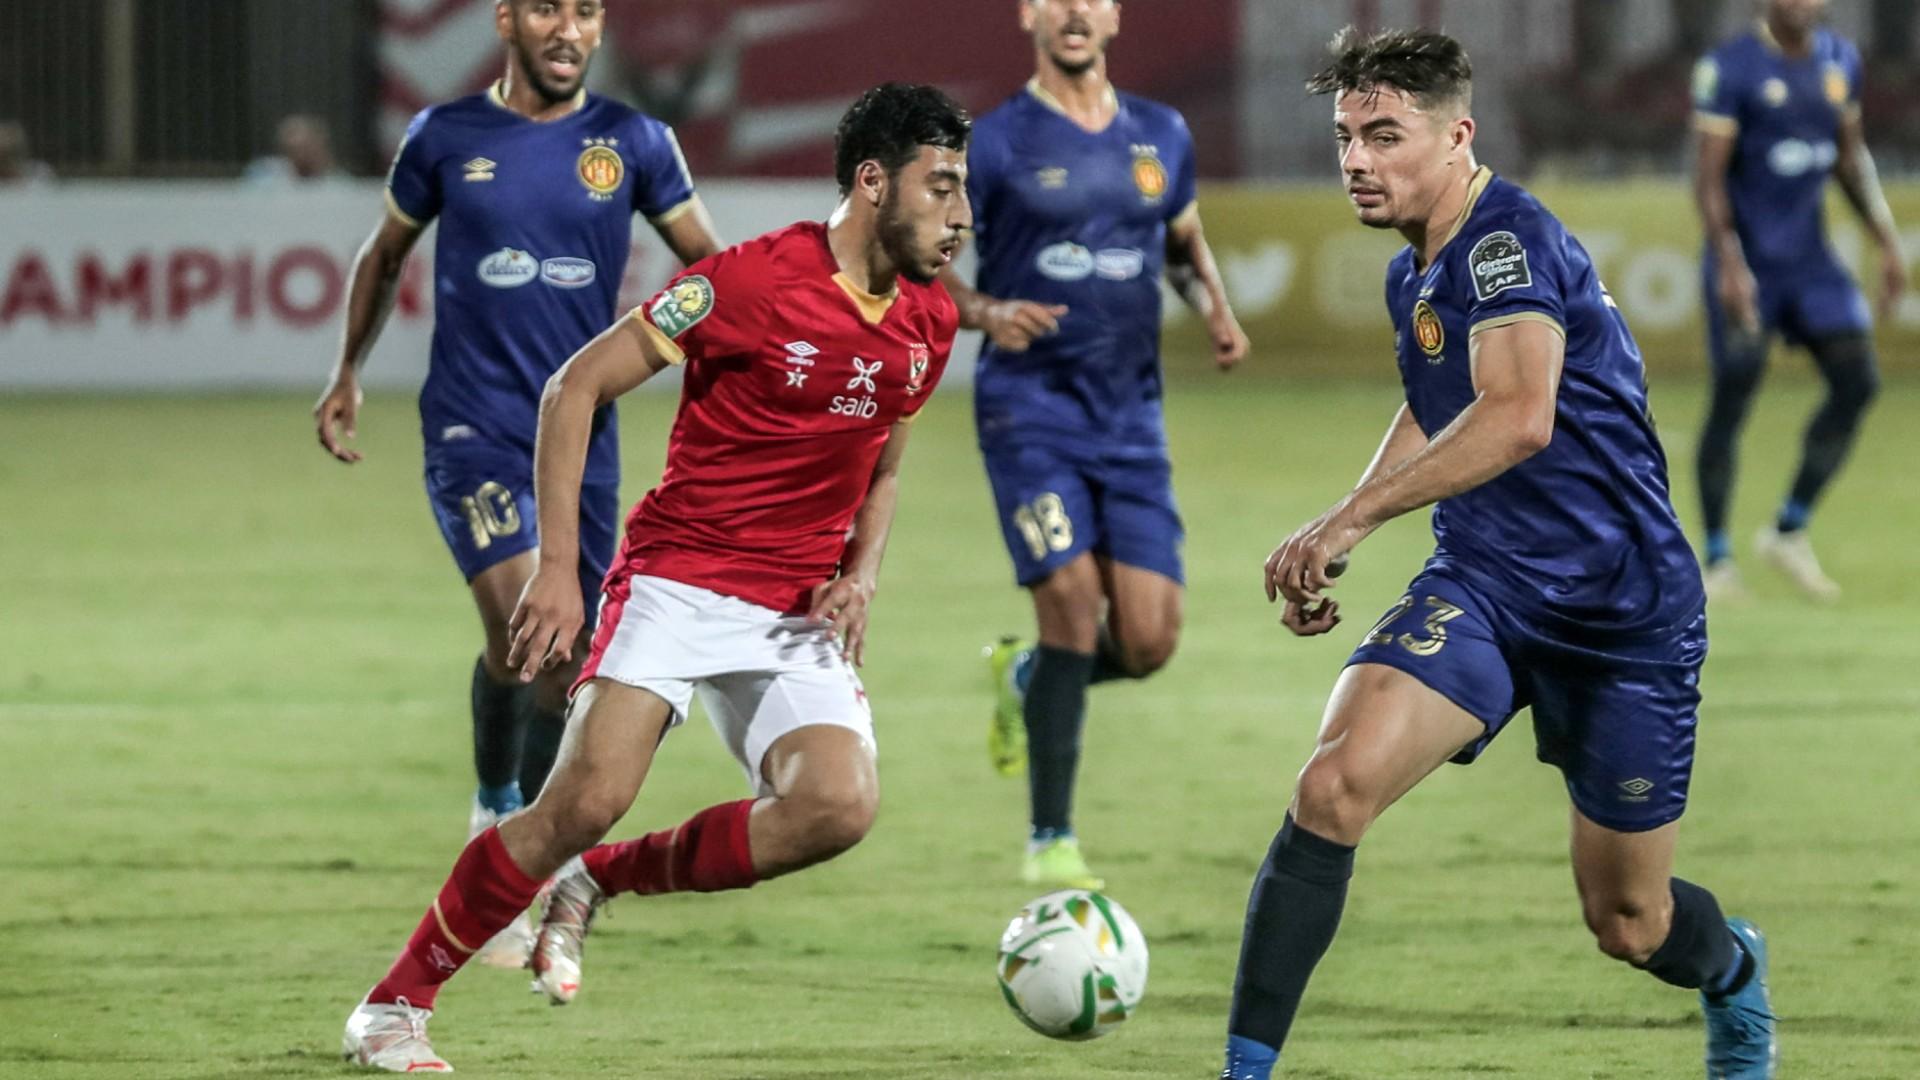 Caf Champions League: Defeating Esperance reflects Al Ahly's character – Abdelhafiz